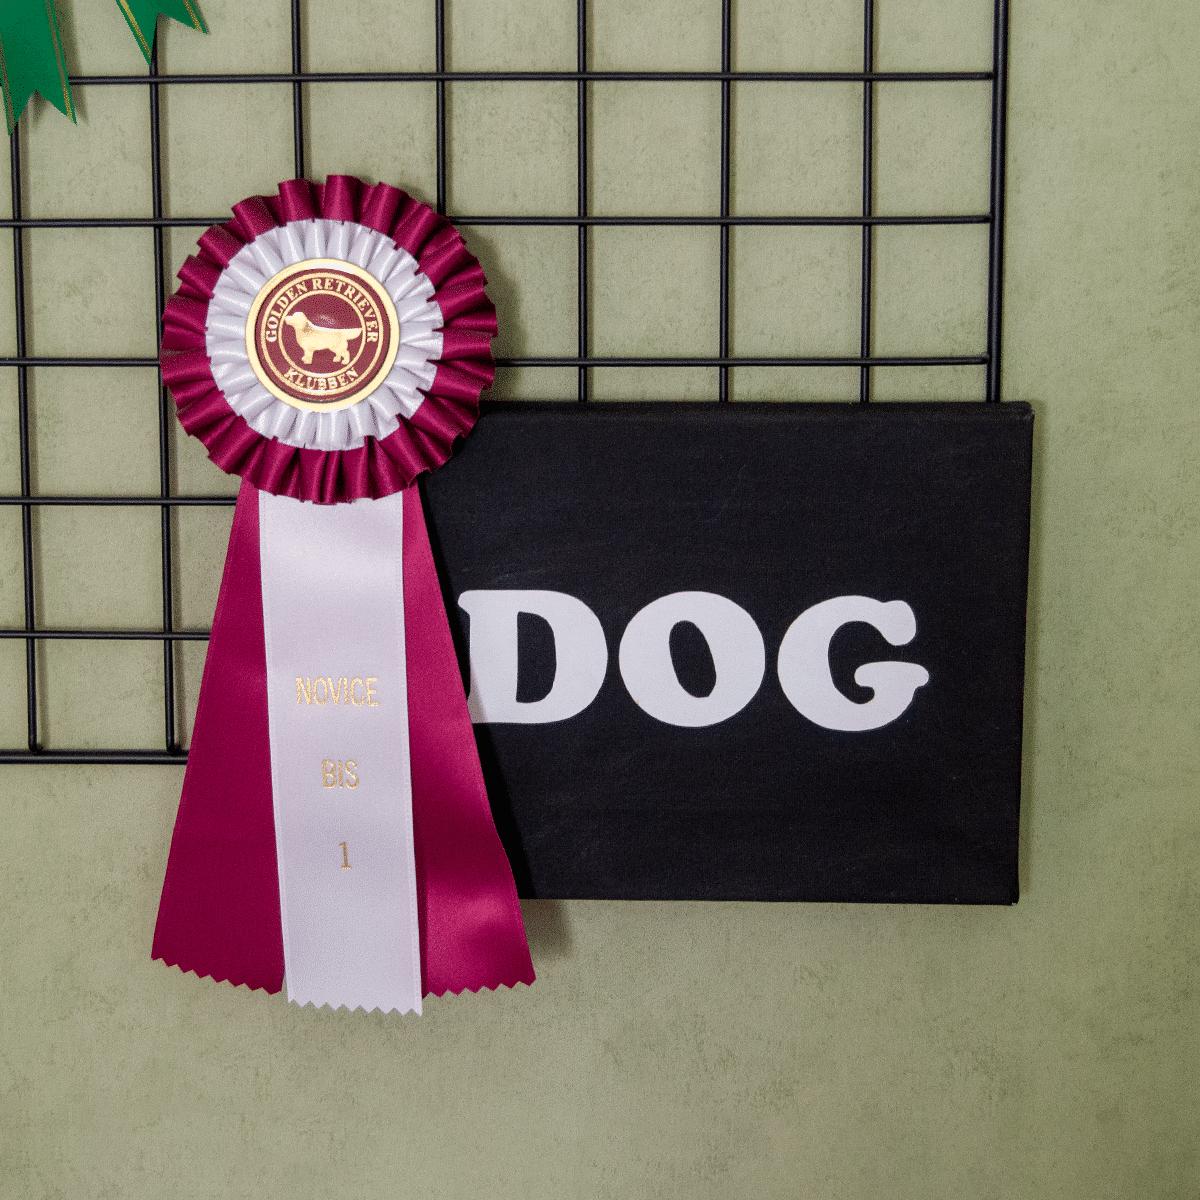 Canvastavla med ordet Dog